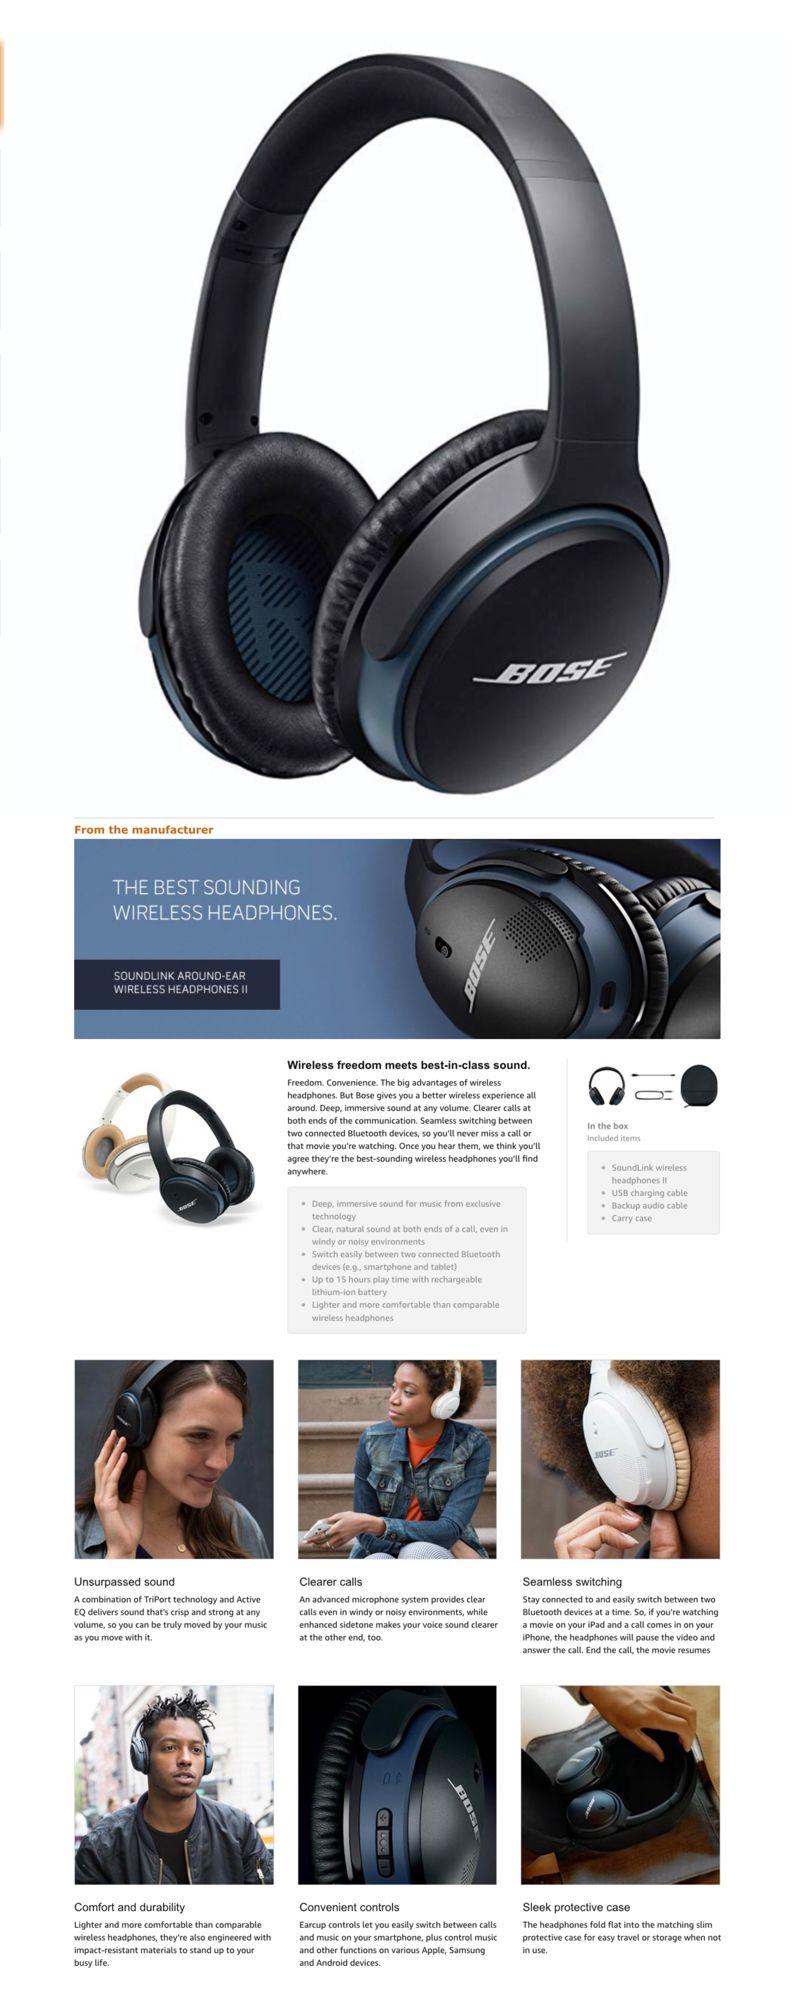 Bose Soundlink Wireless Headphones Bose Soundlink Headphones